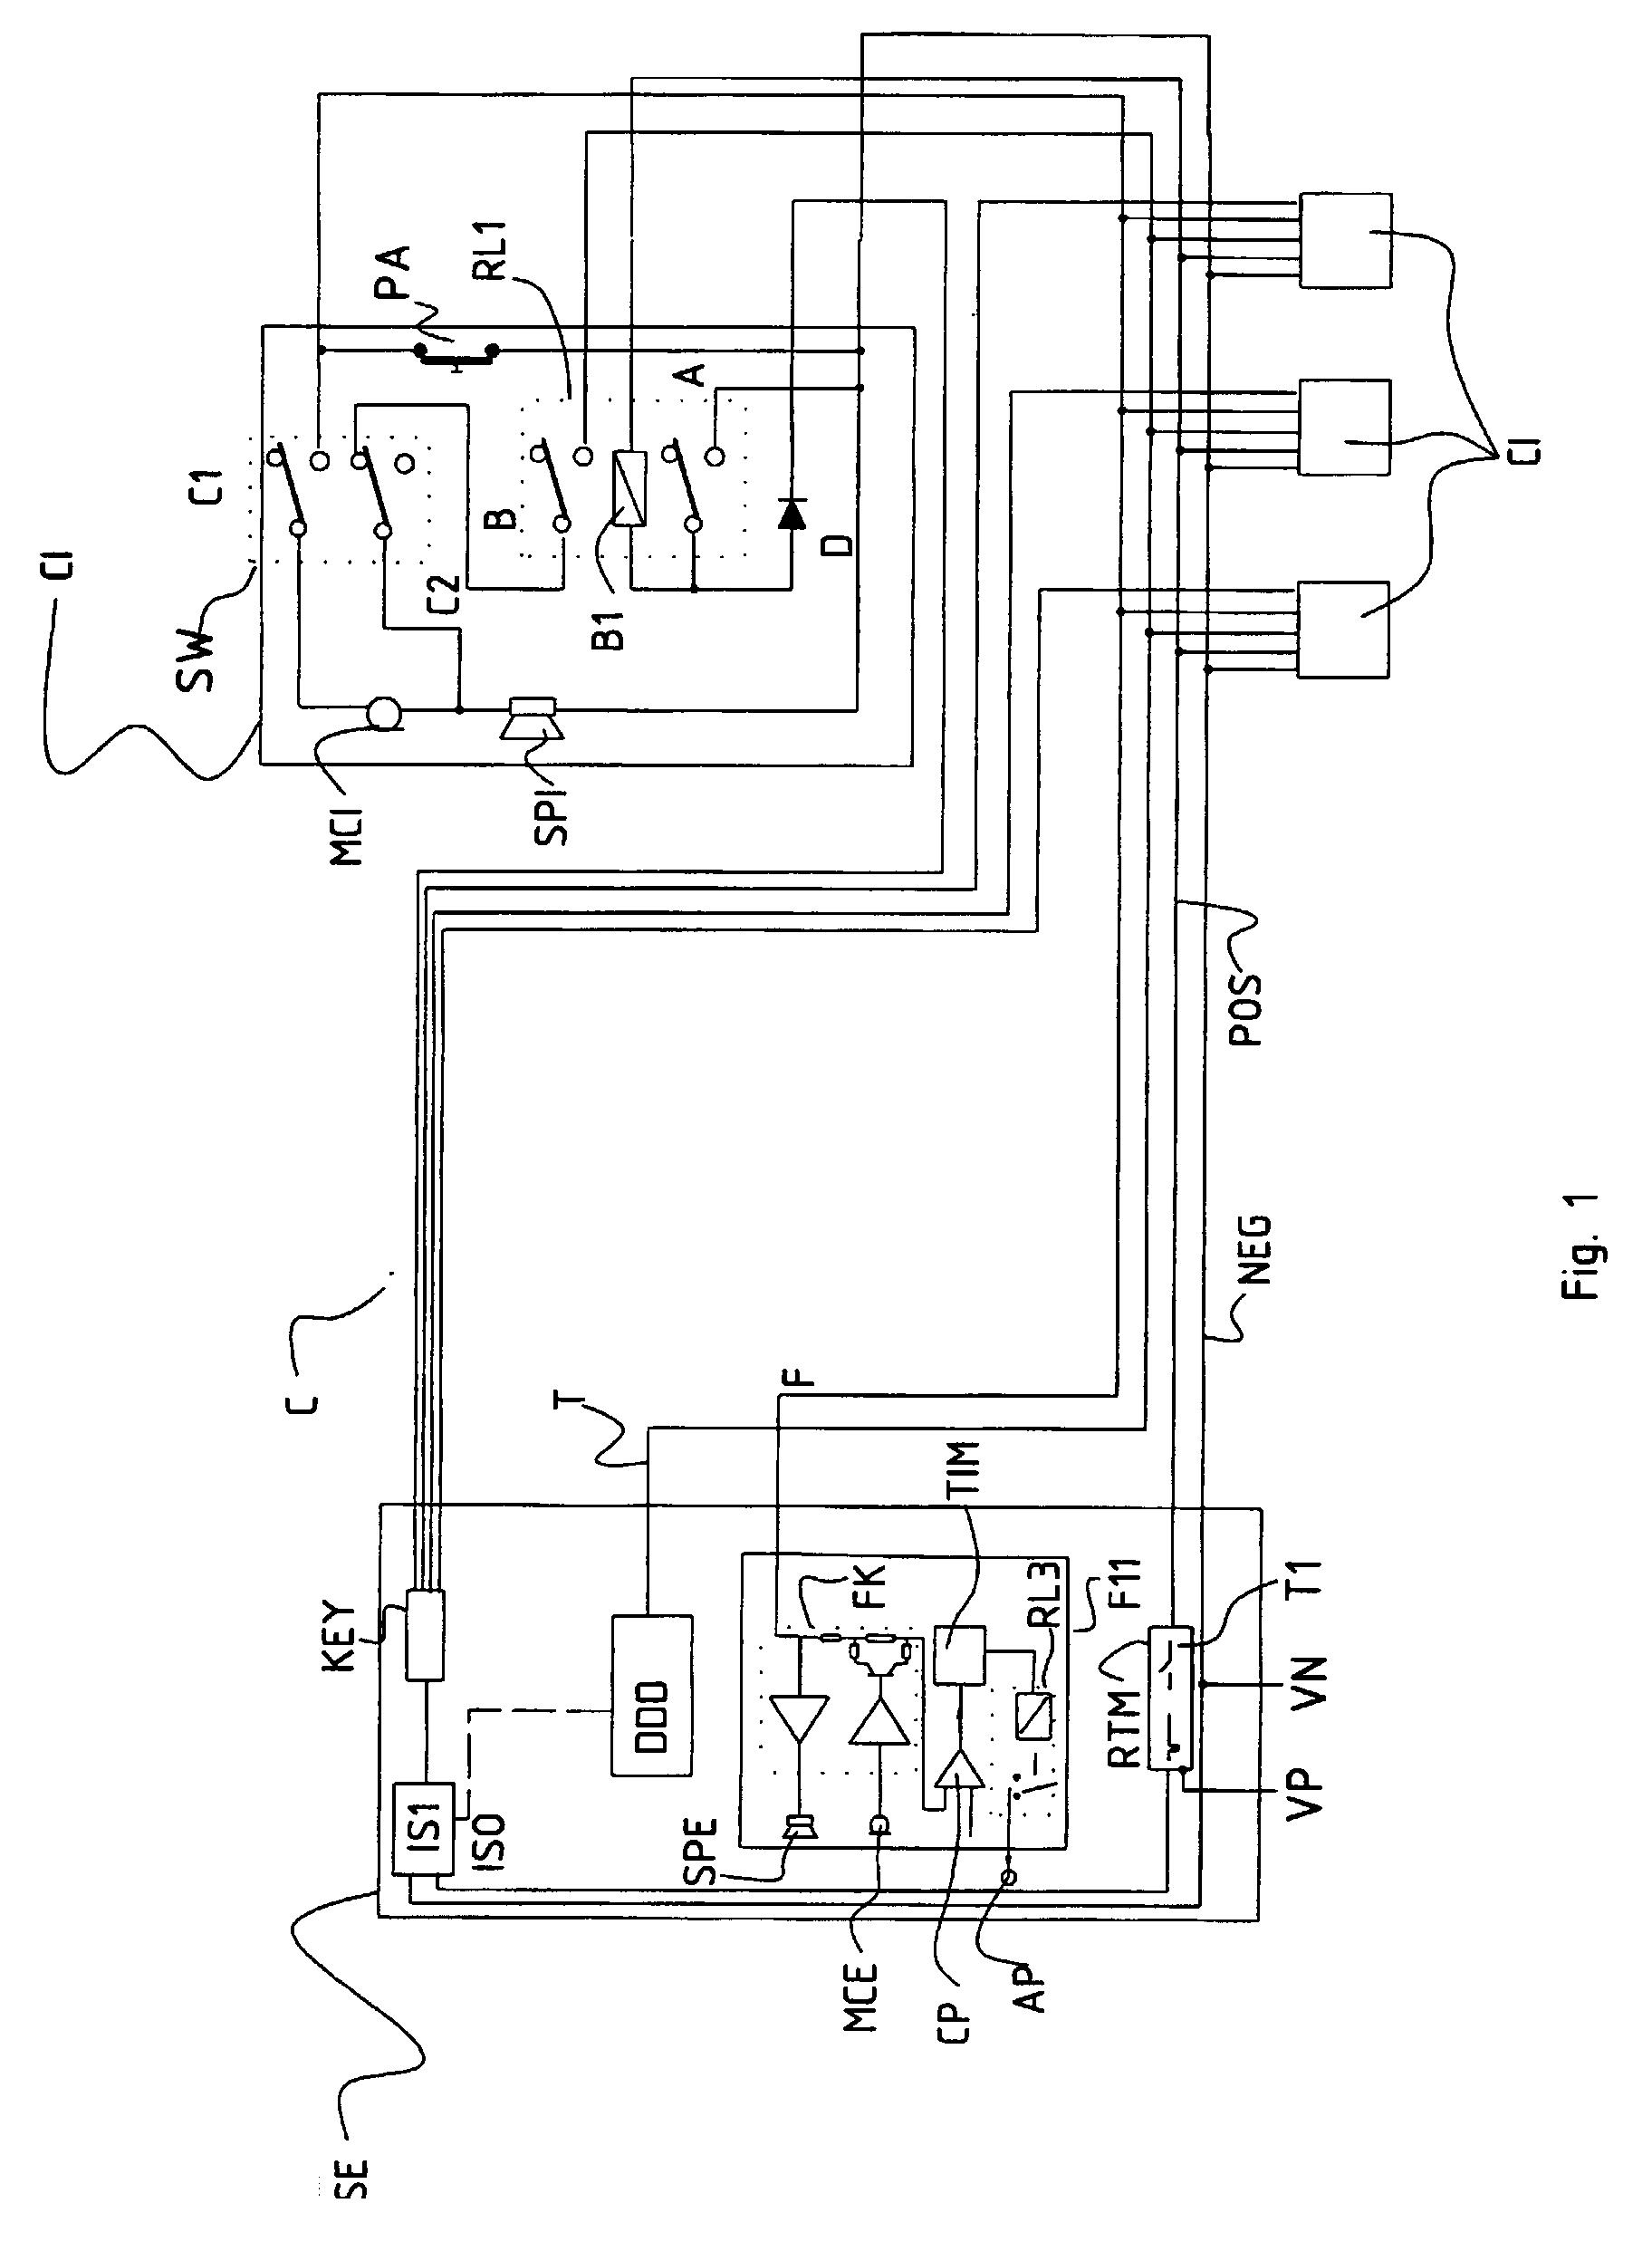 WRG-5951] Mci Wiring Diagrams